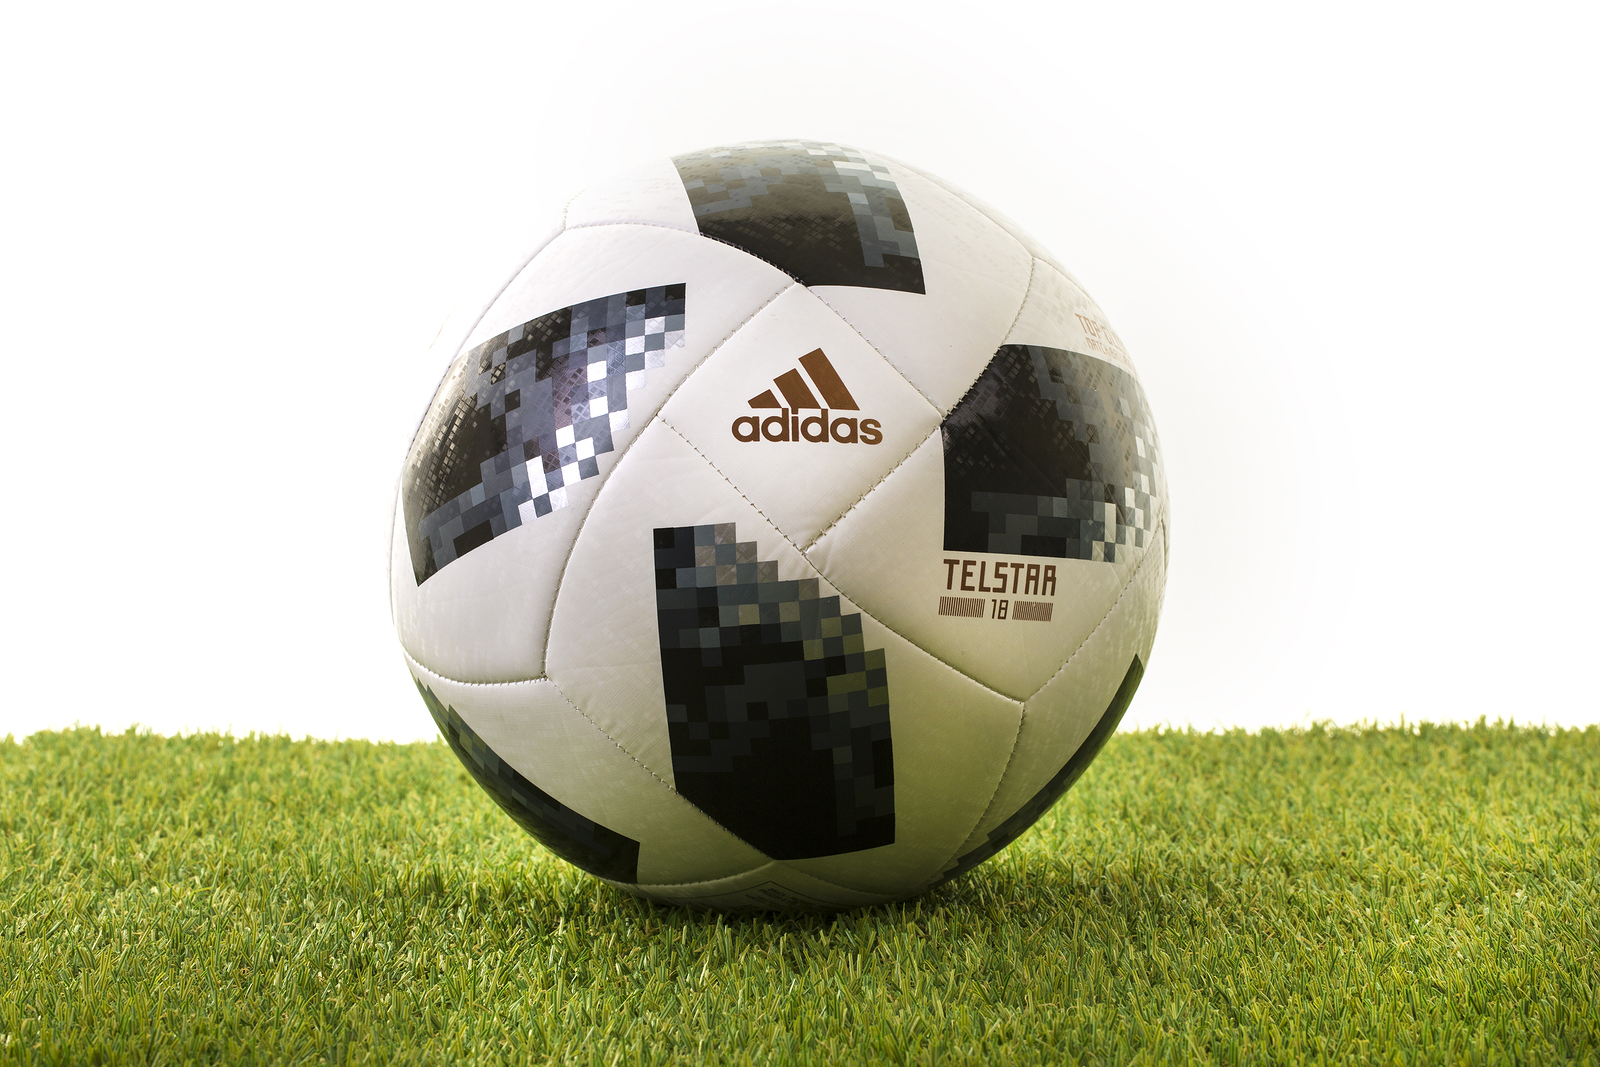 pelota del mundial 2018